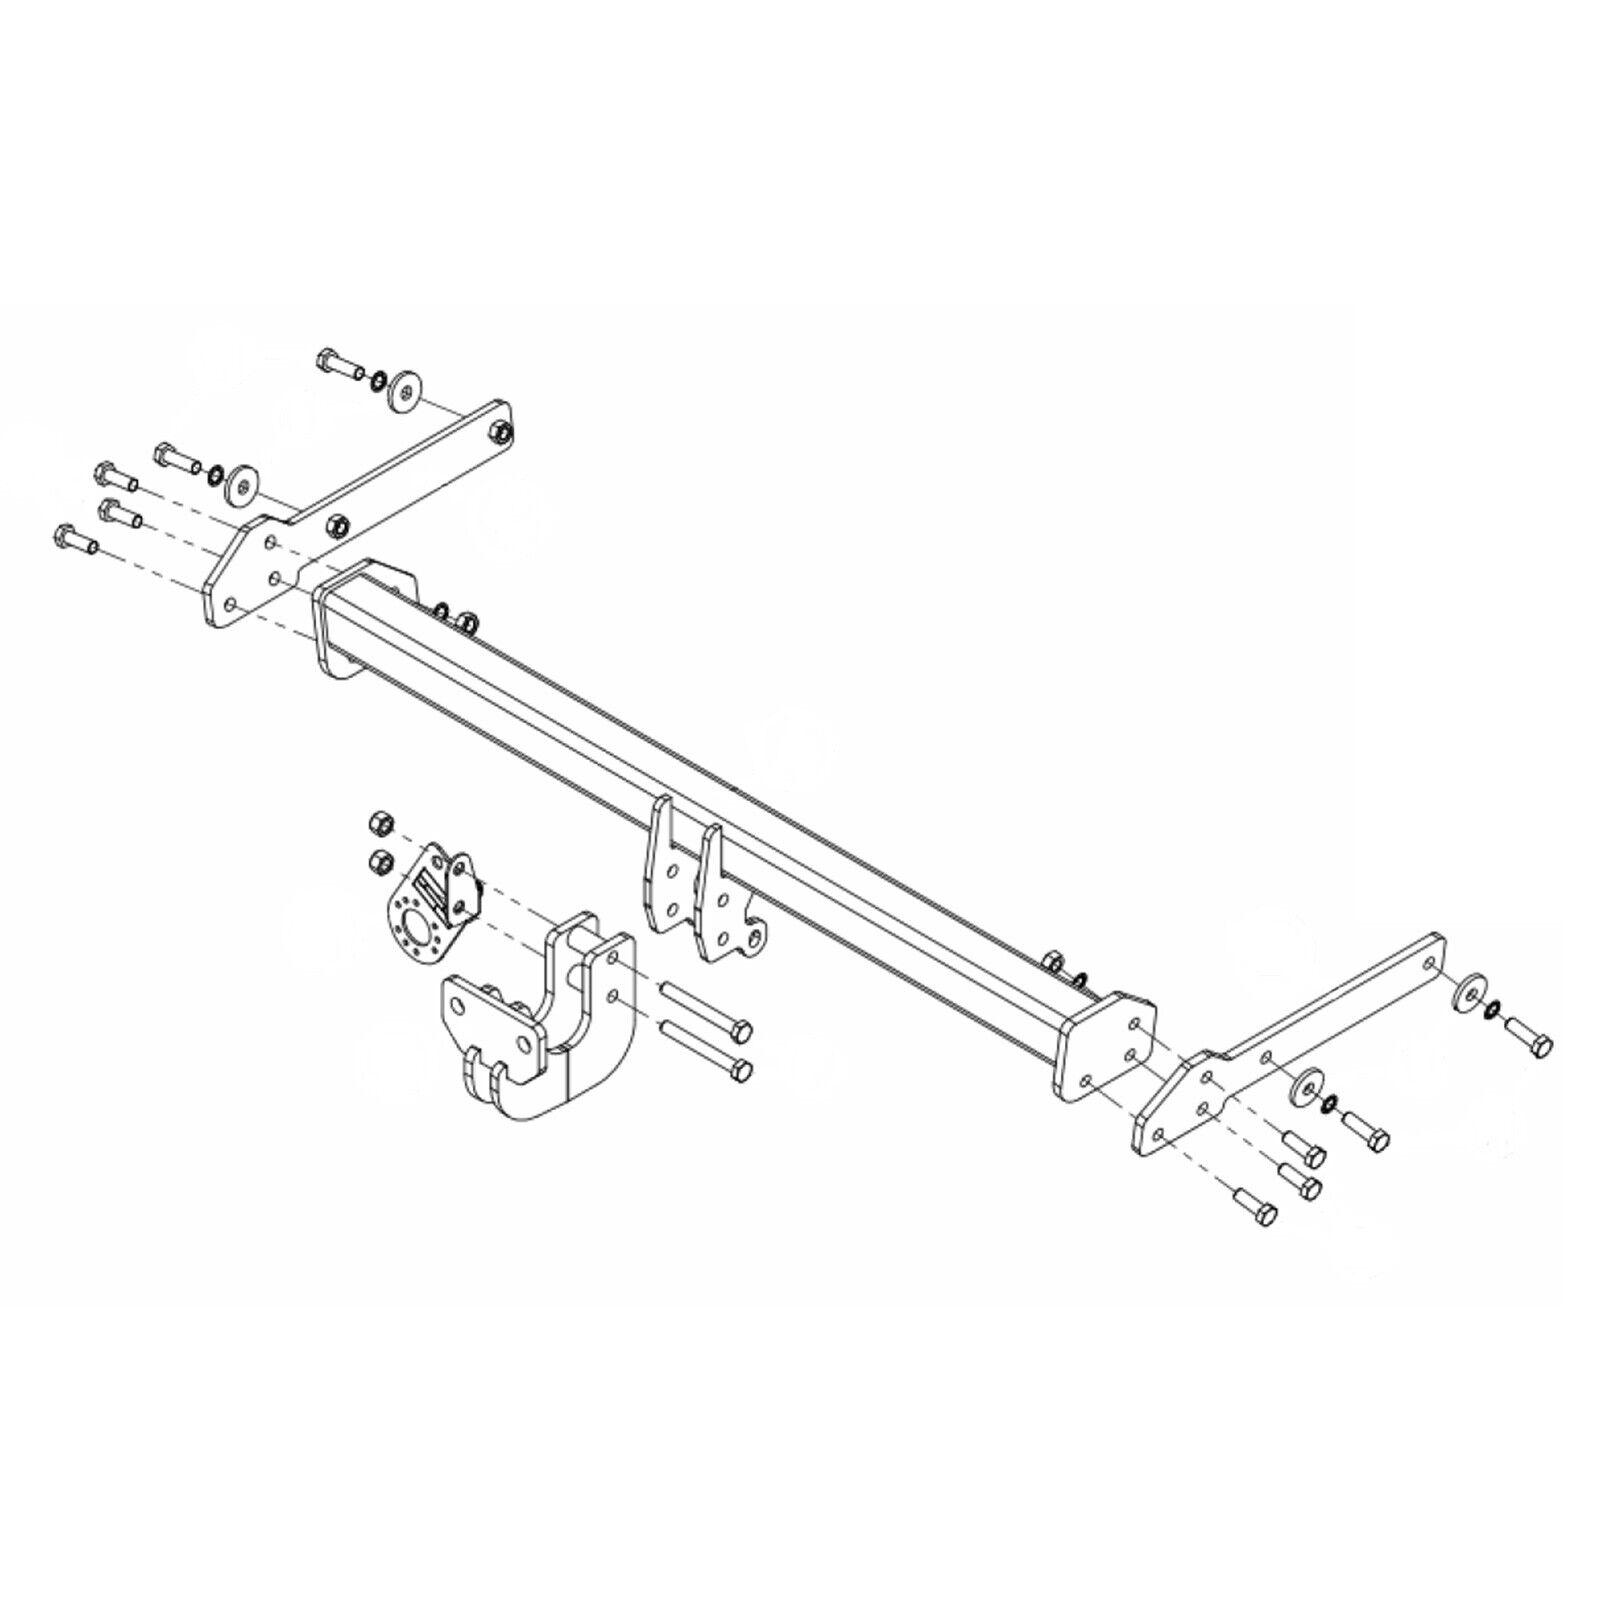 details about towbar for skoda octavia estate 2013 onwards flange tow bar [ 1600 x 1600 Pixel ]